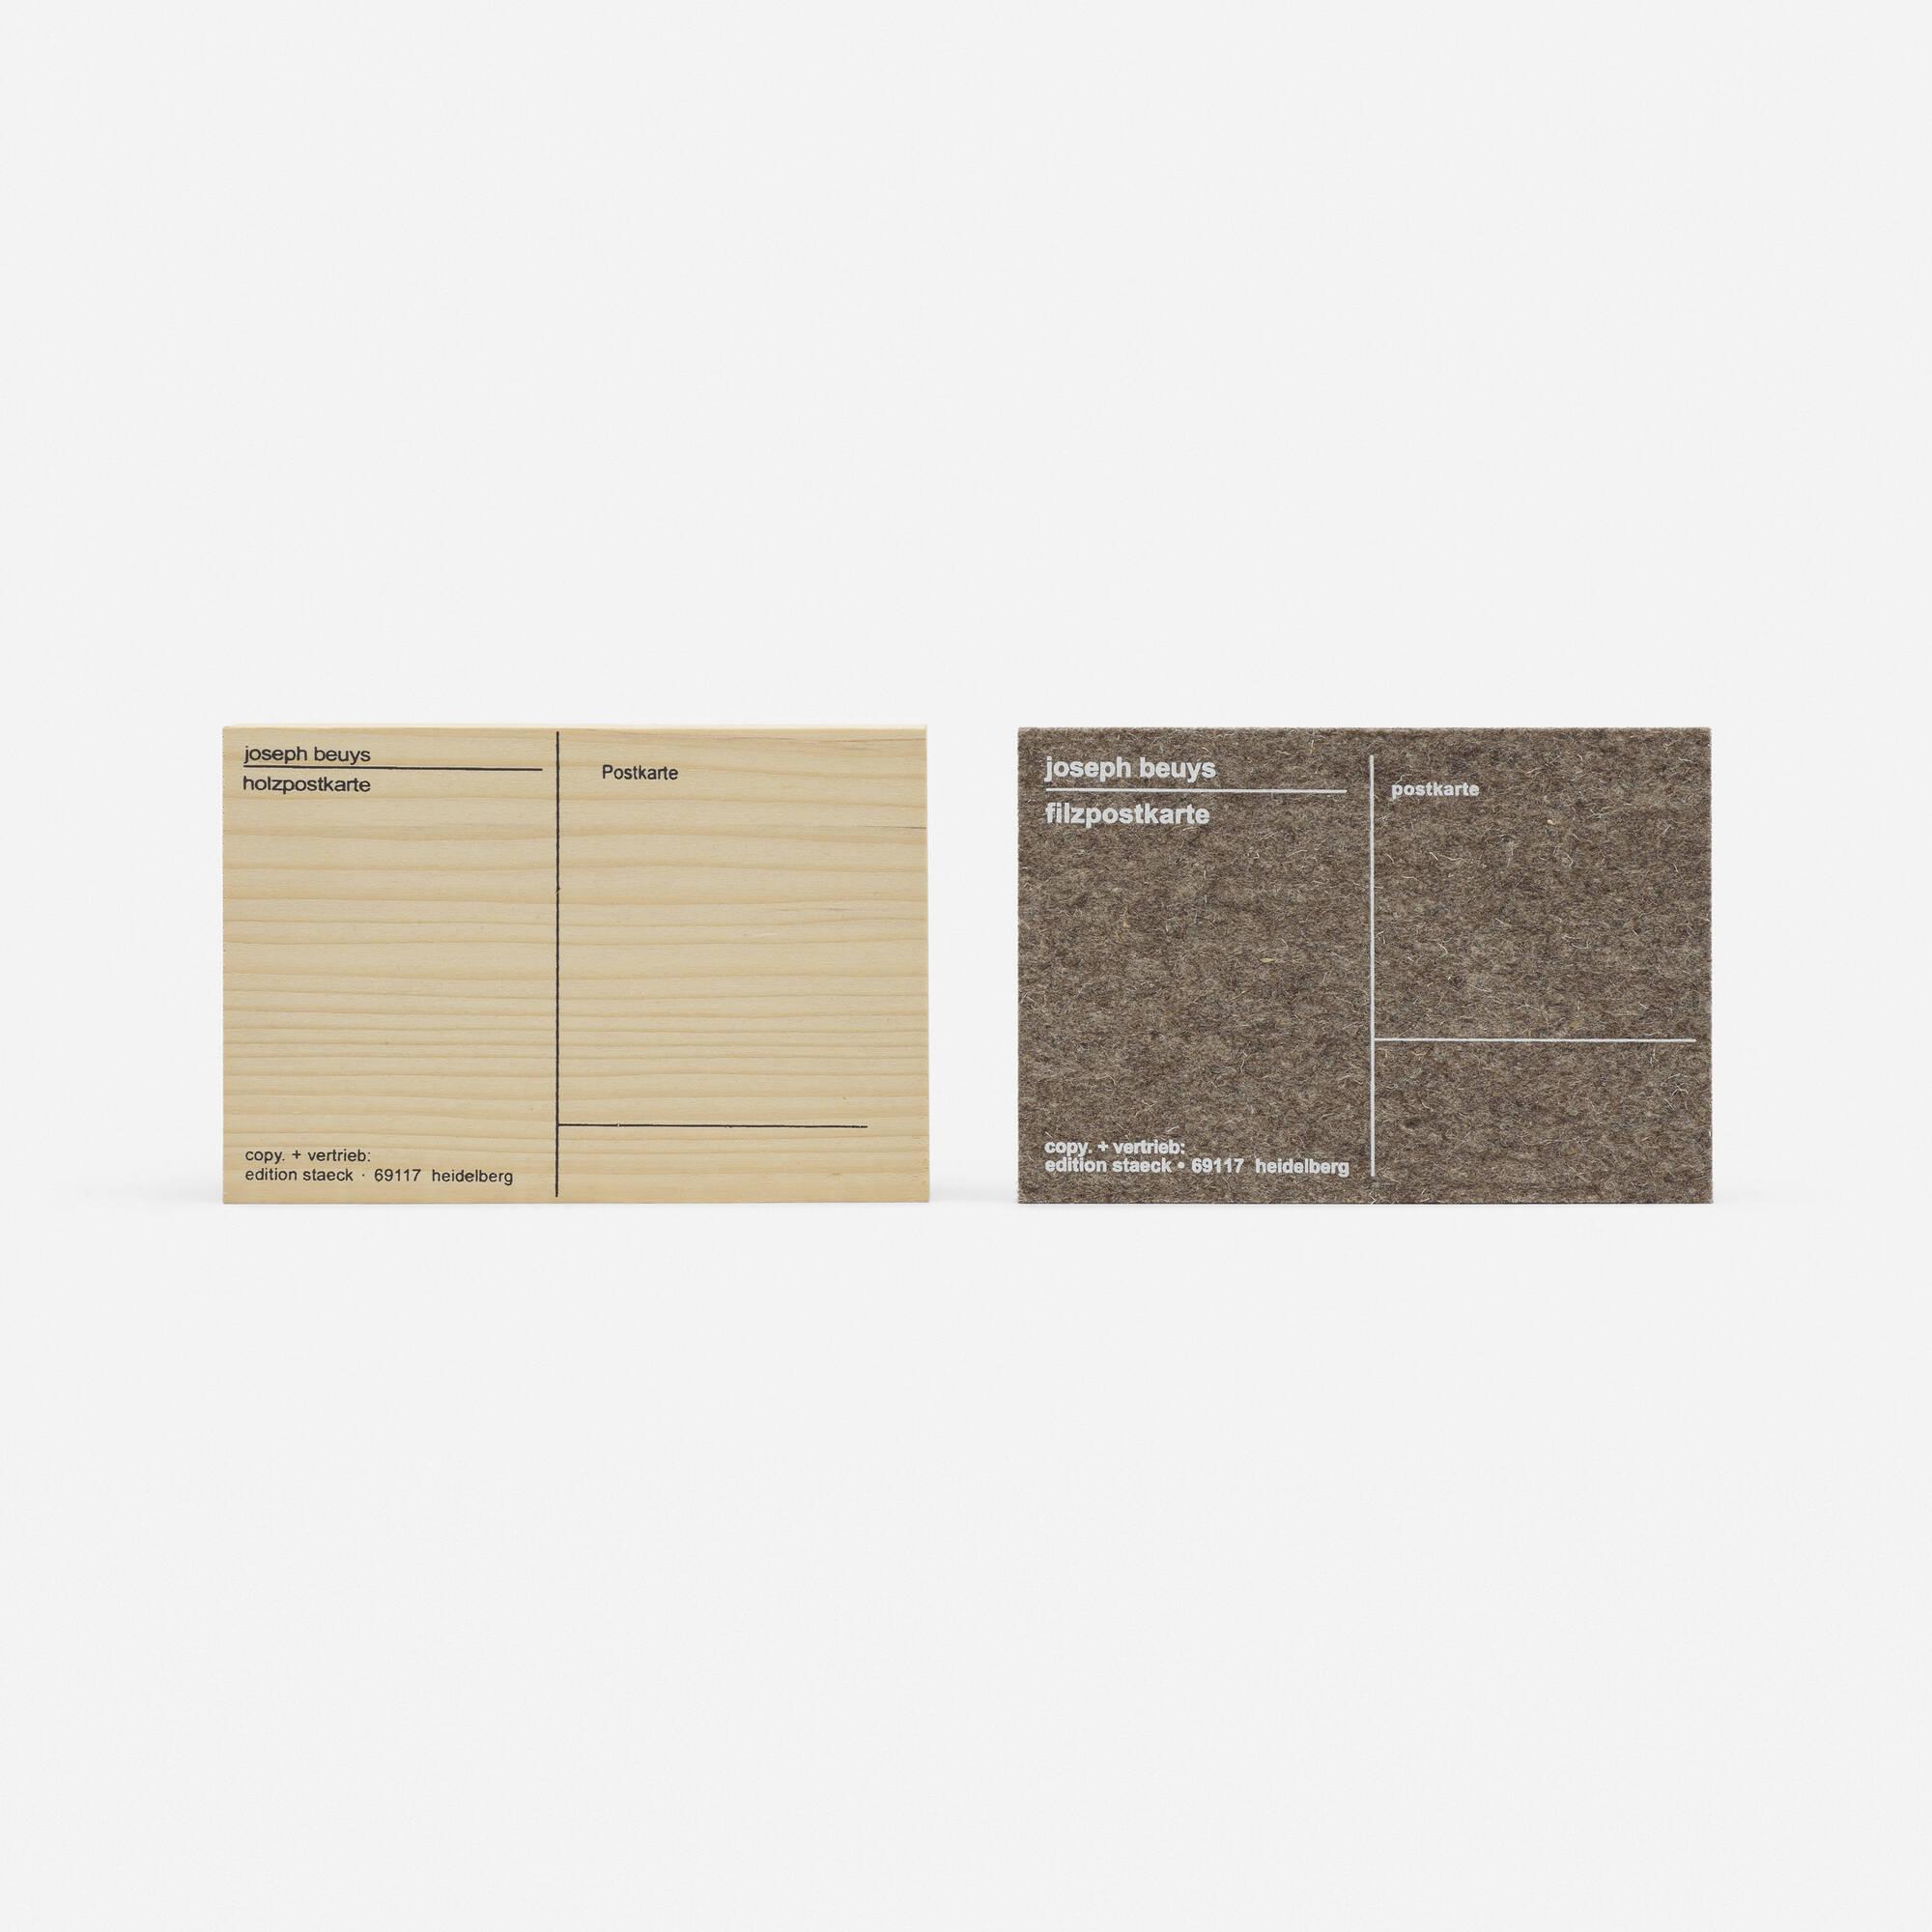 174: Joseph Beuys / Filzpostkarte and Holzpostkarte (1 of 1)